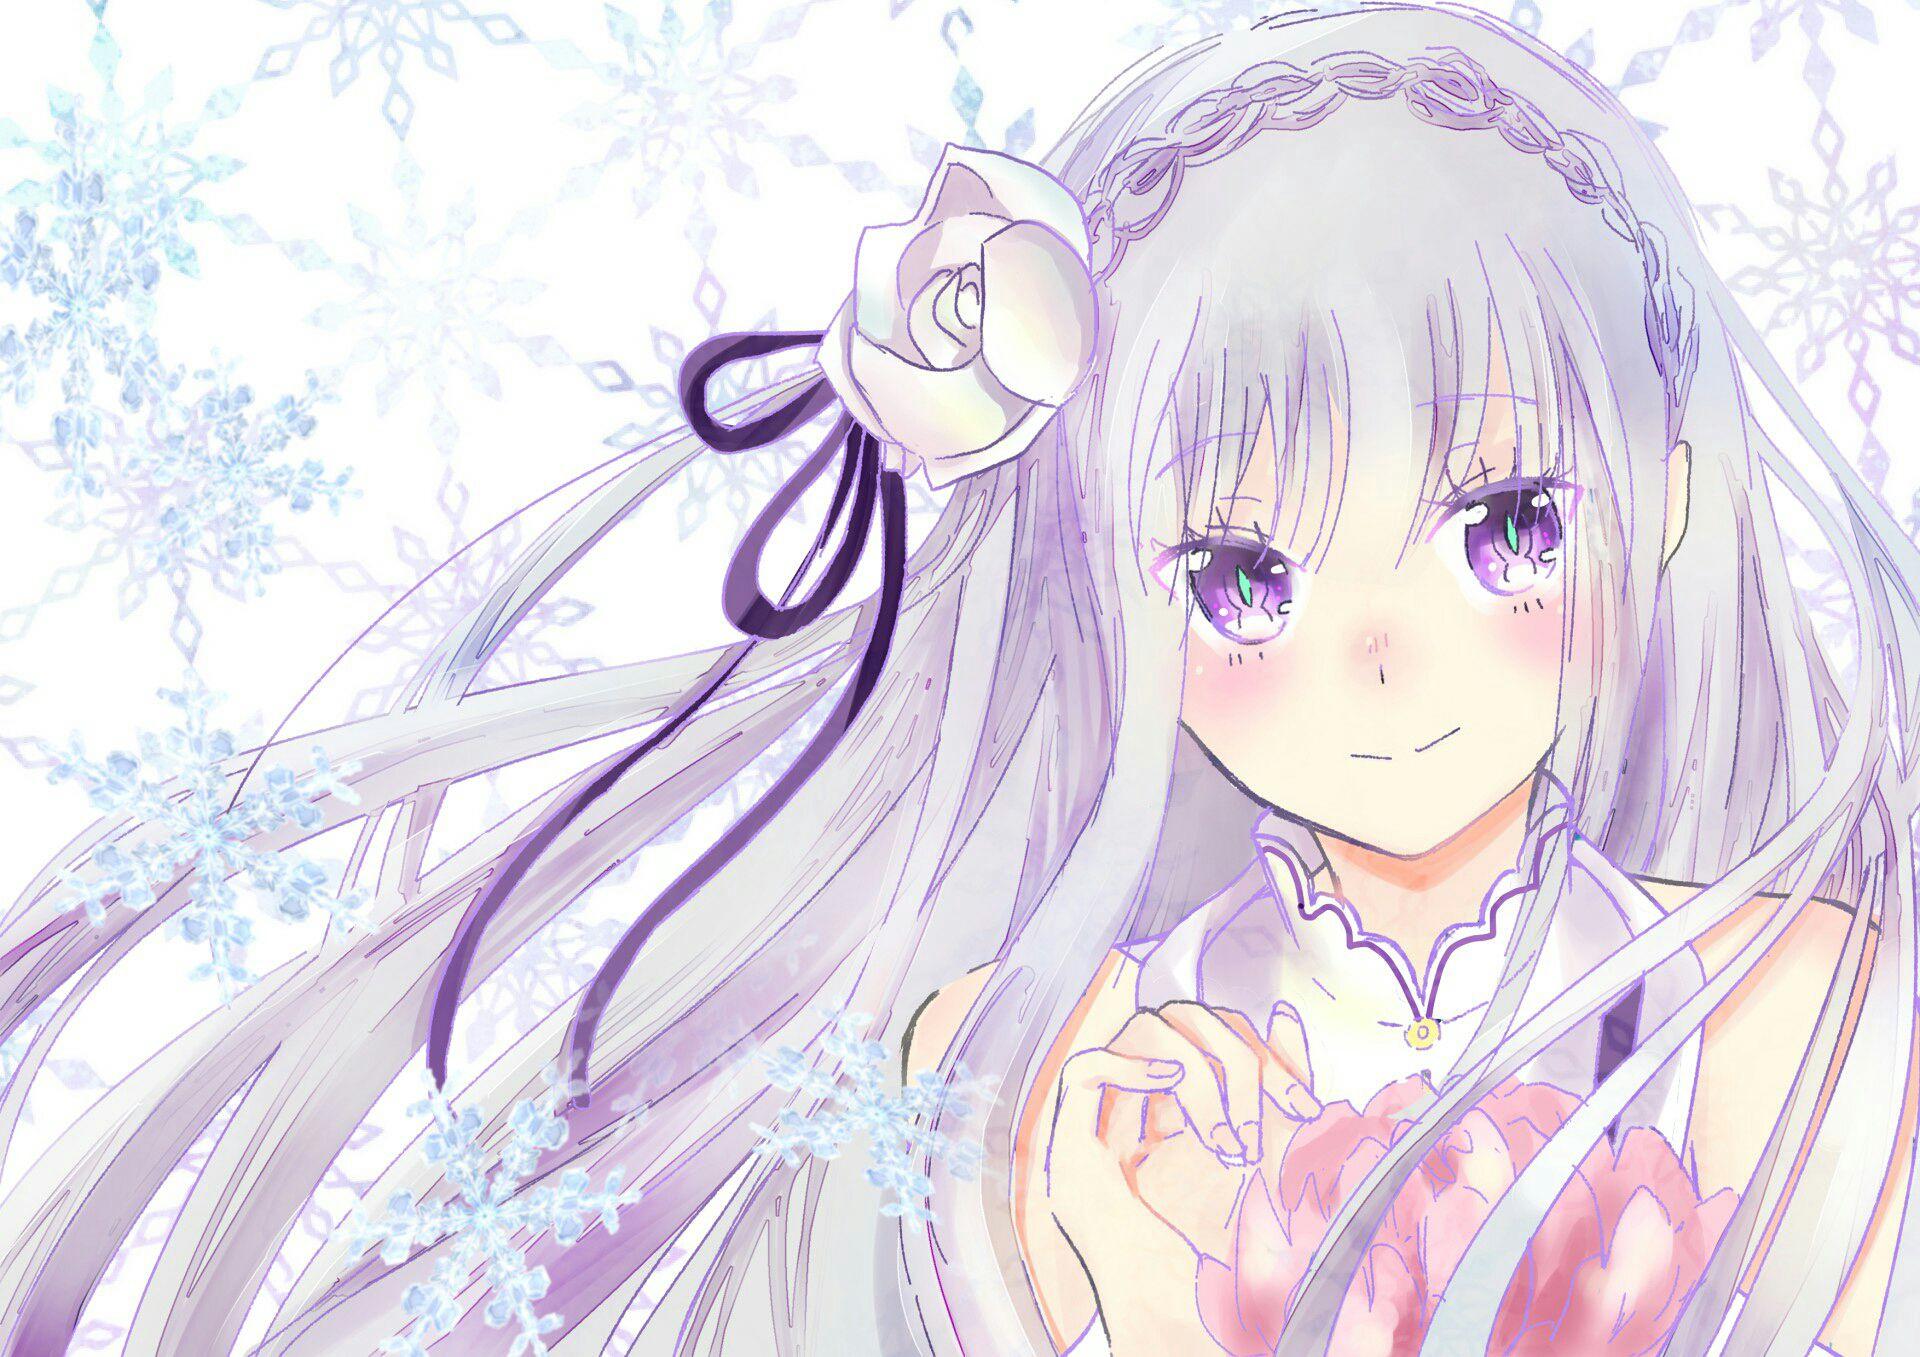 Yuri Oneshots (Girl X Girl) - Emilia x fem! reader (Re:zero) - Wattpad